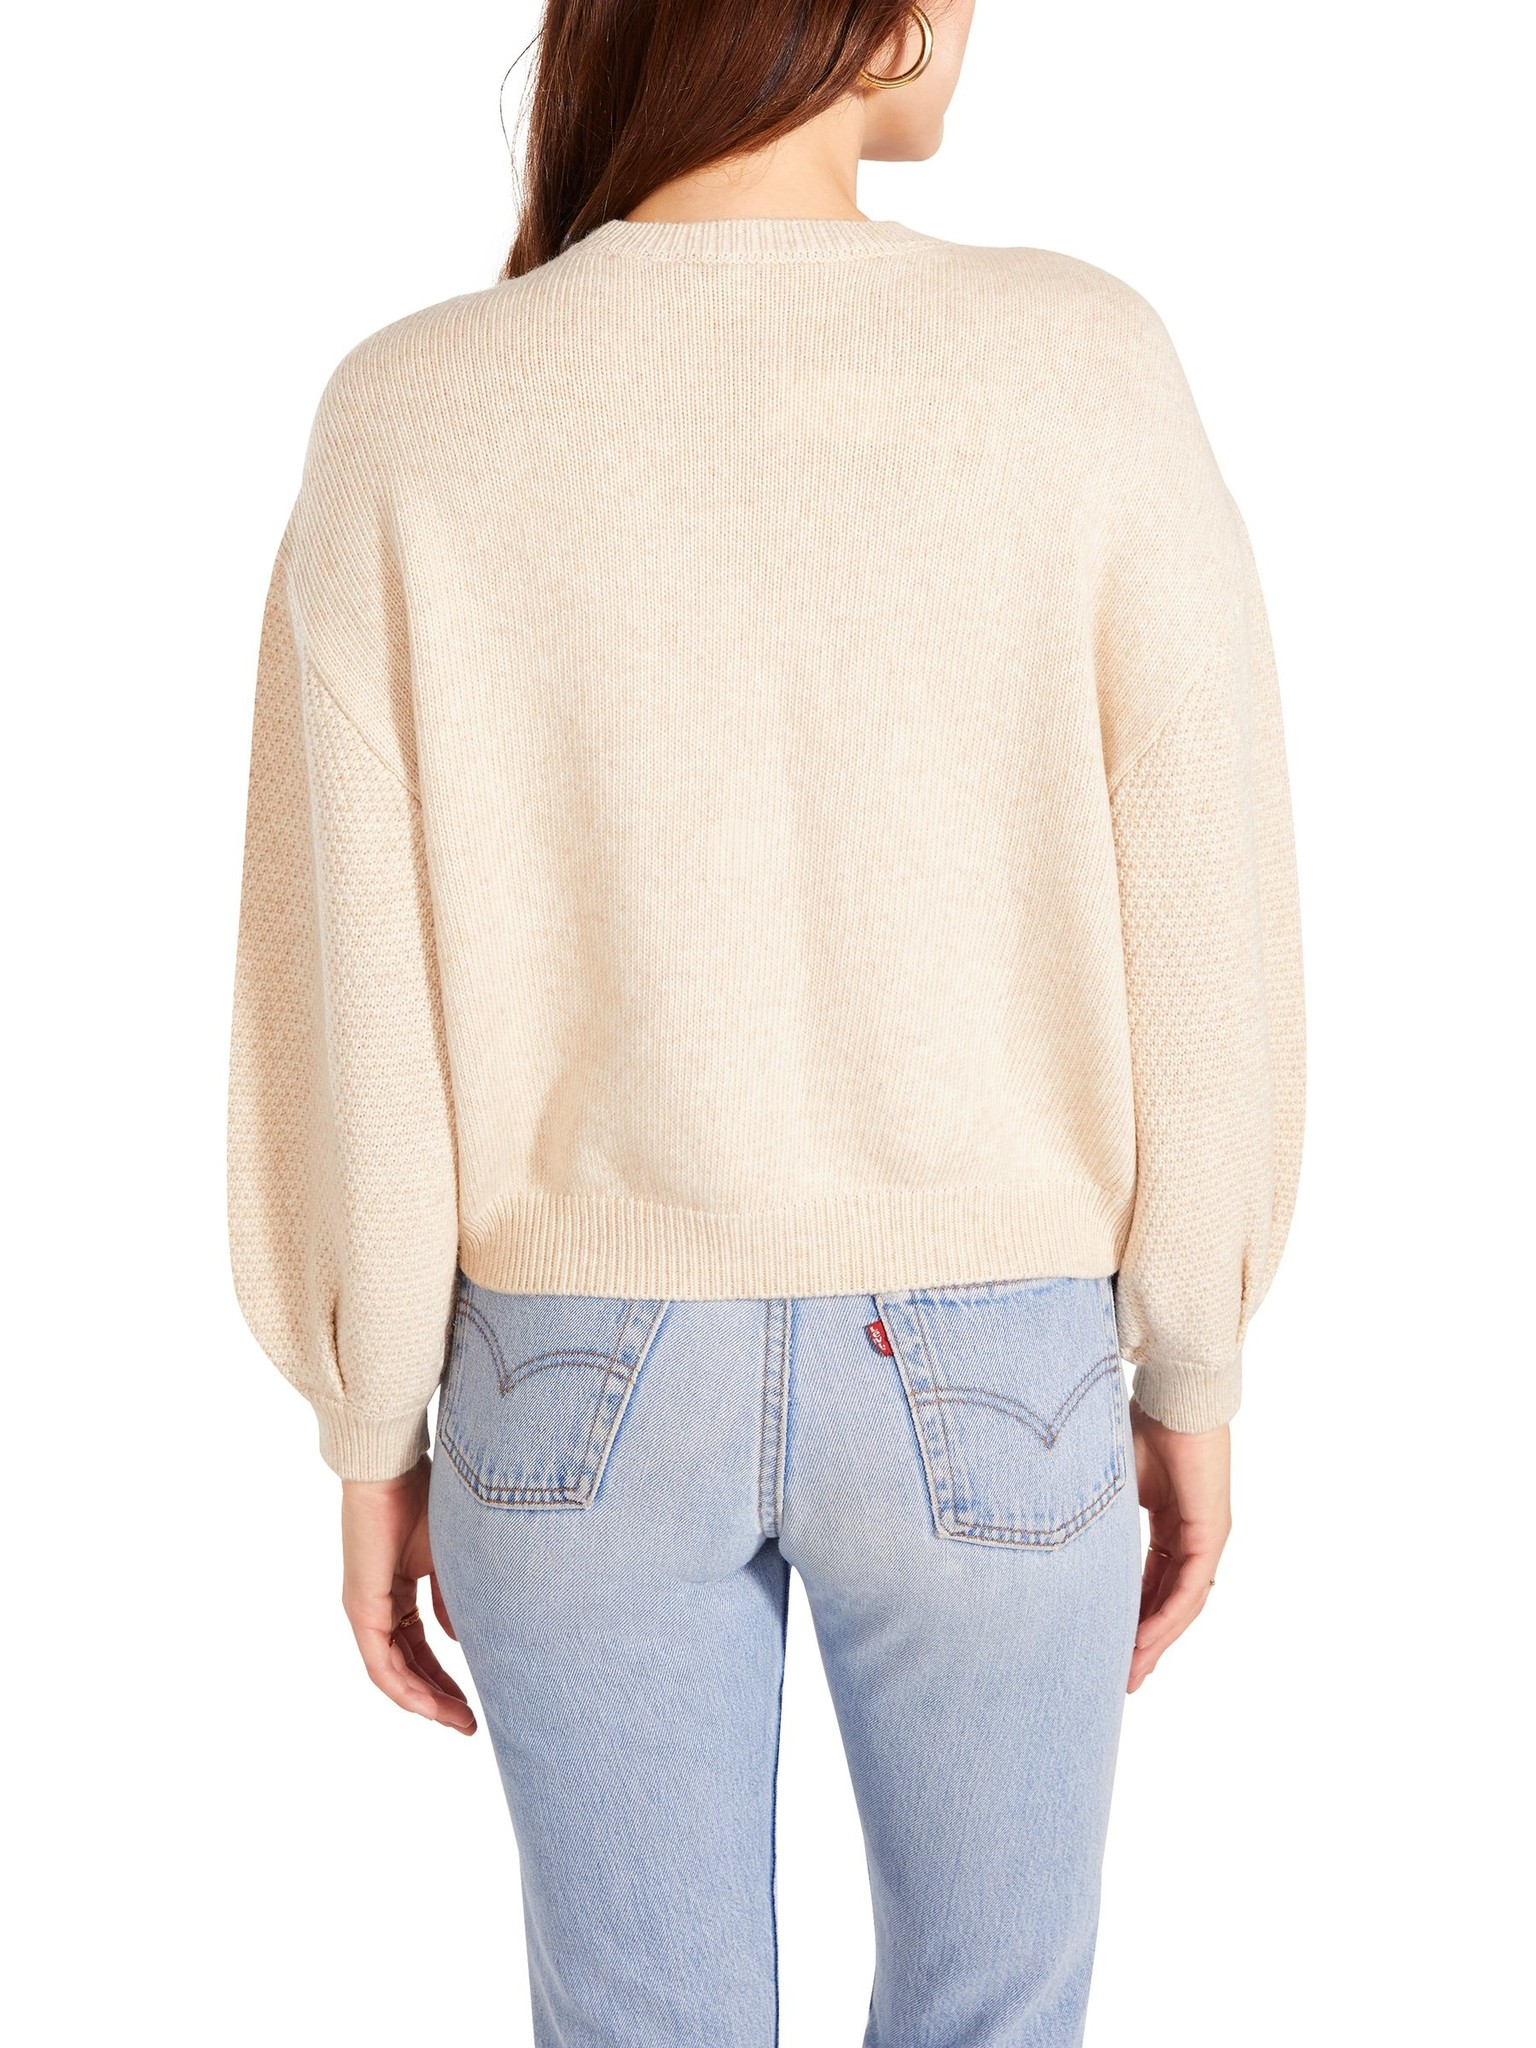 BB Dakota Daisy Little Thing Sweater